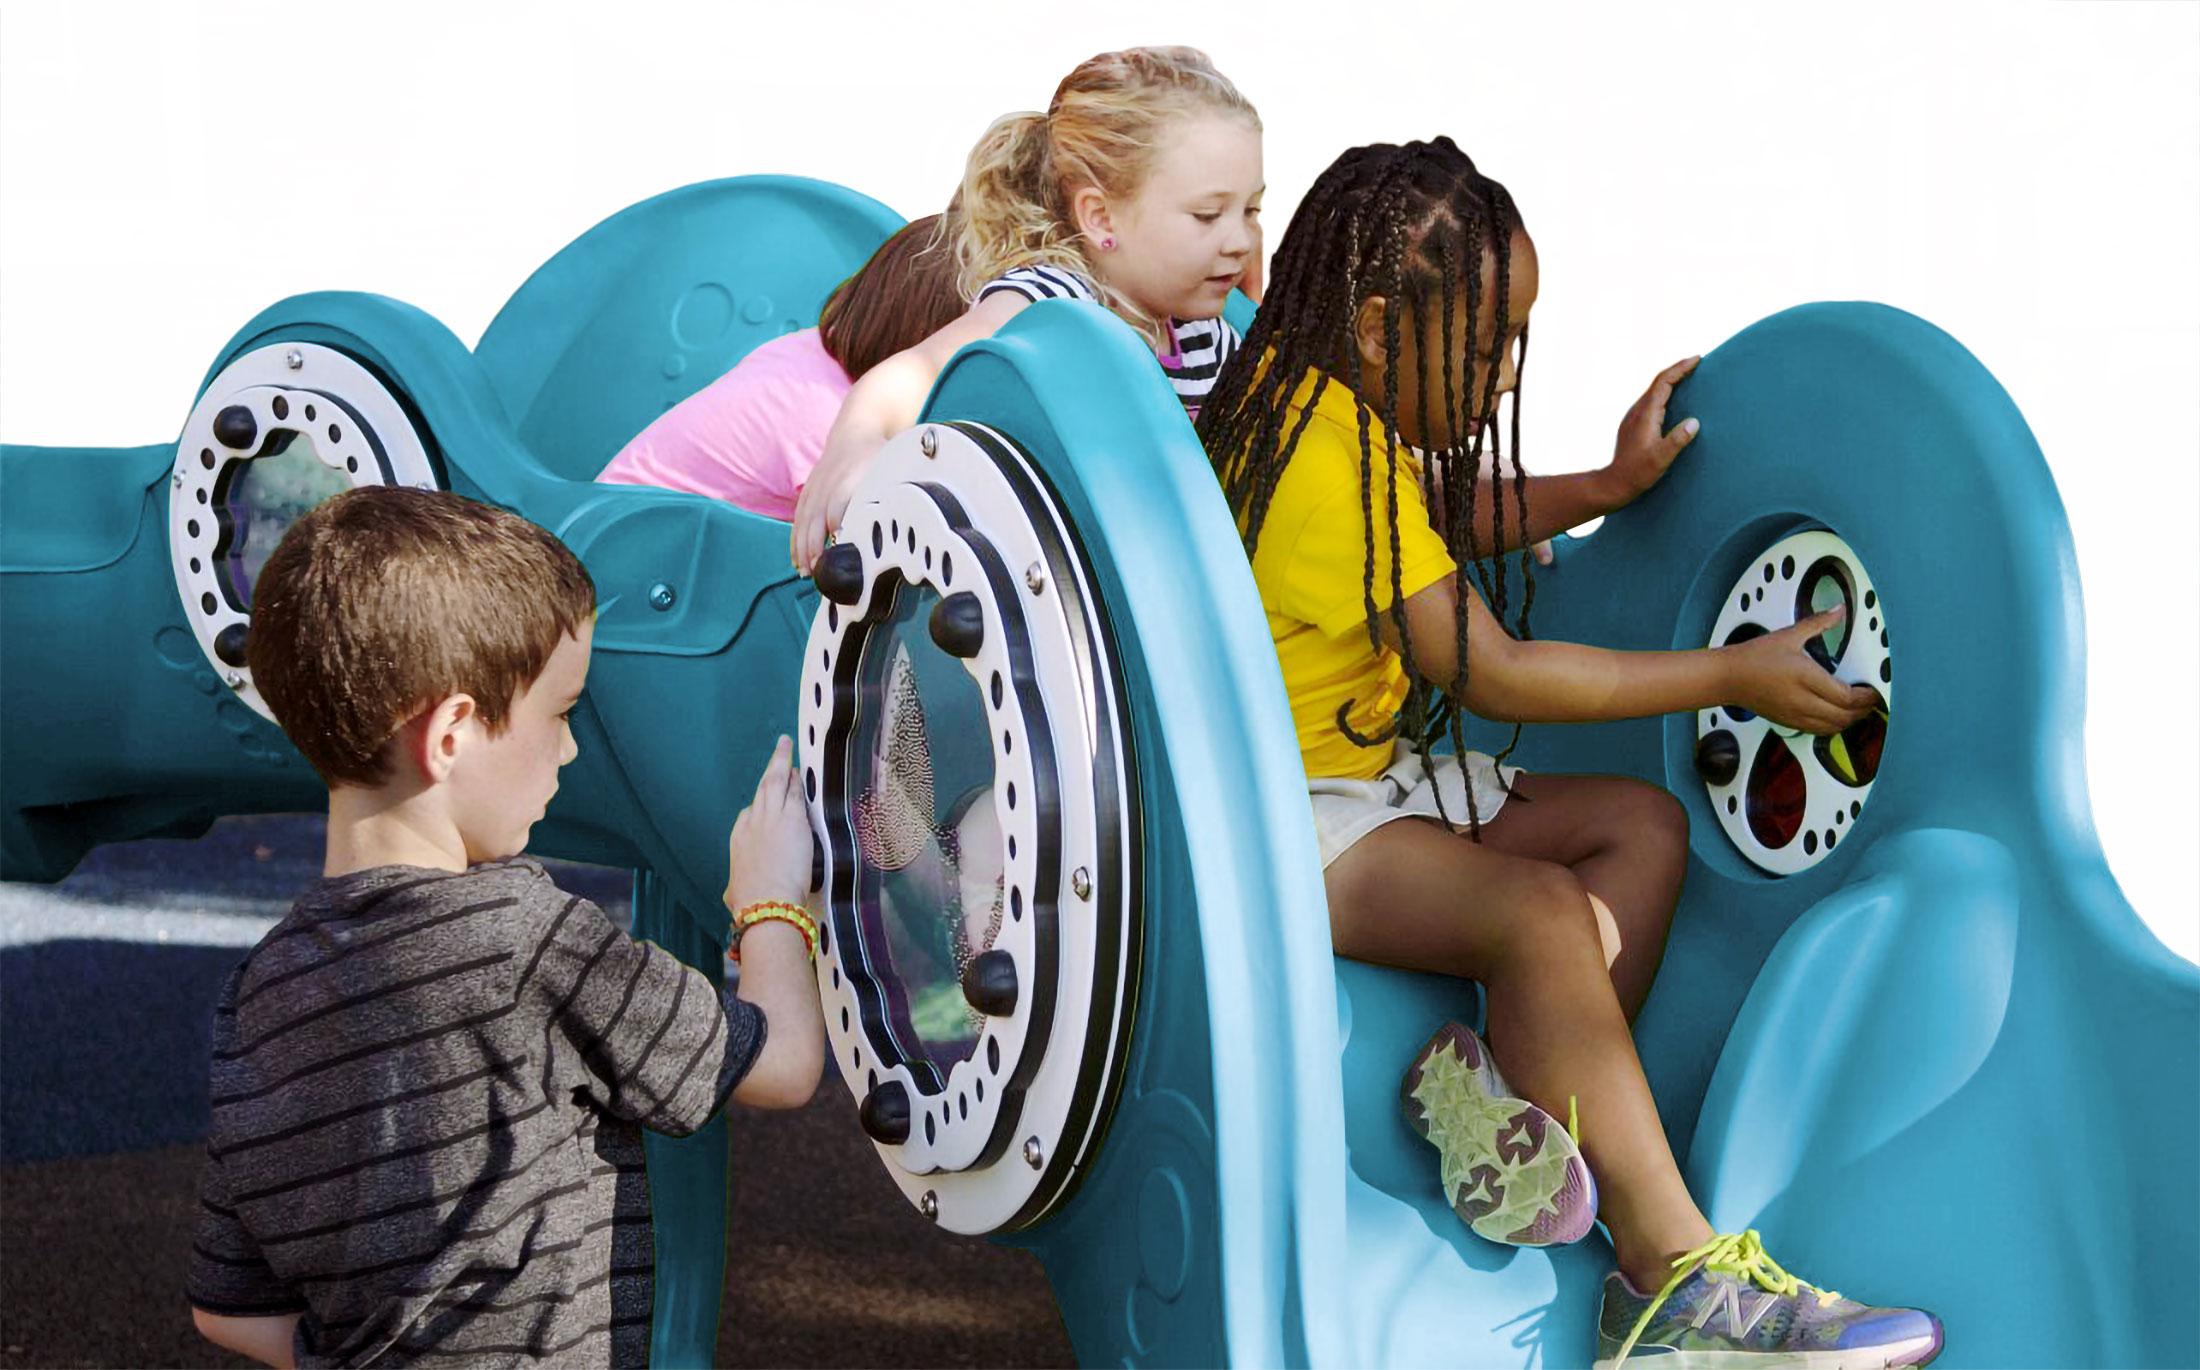 Kids playing on the Playcore Sensory Wave Climber